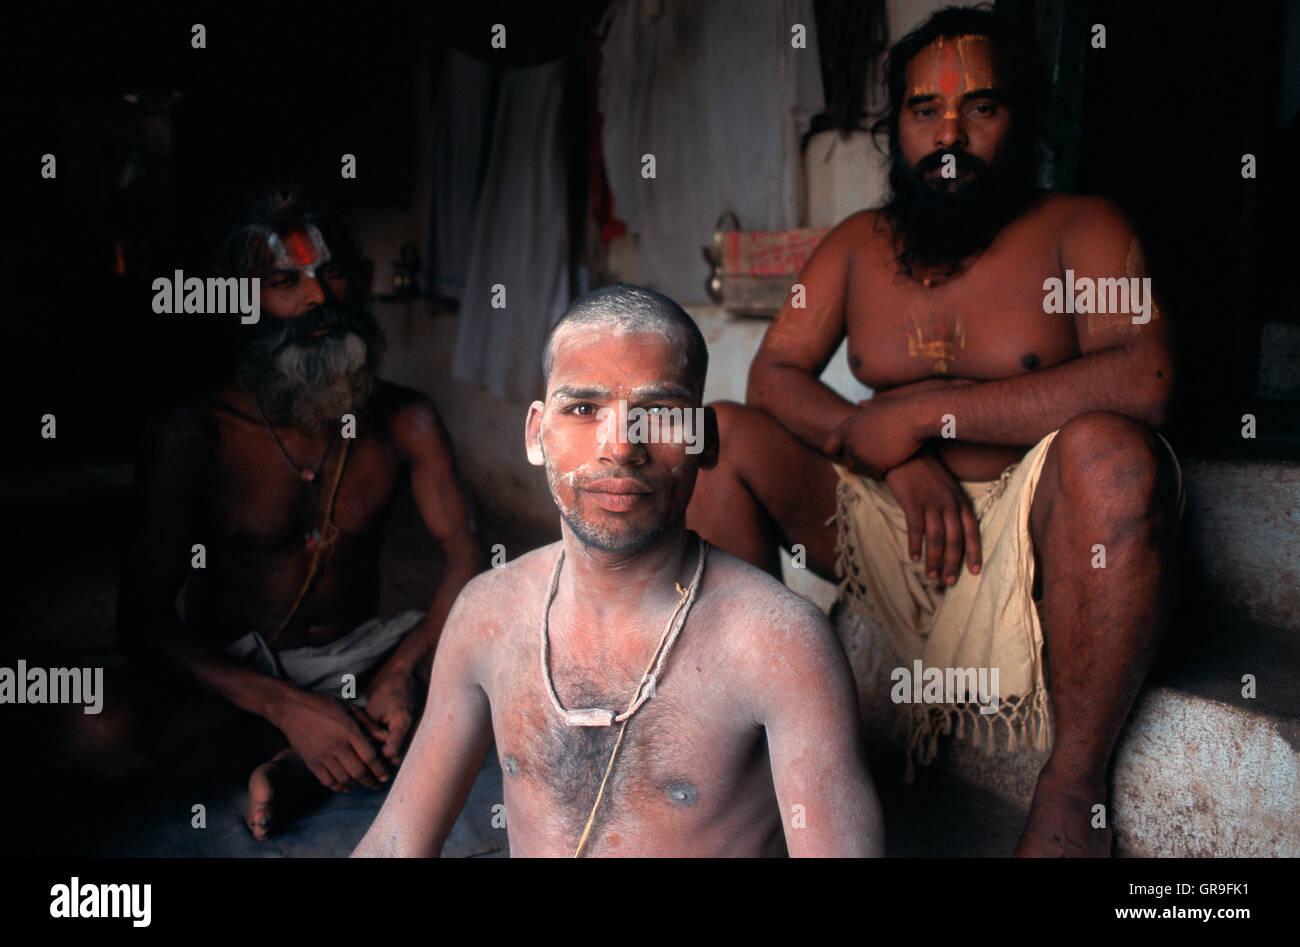 Hindu renunciants ('sadhu') belonging to the Vairagi sect ( India) - Stock Image